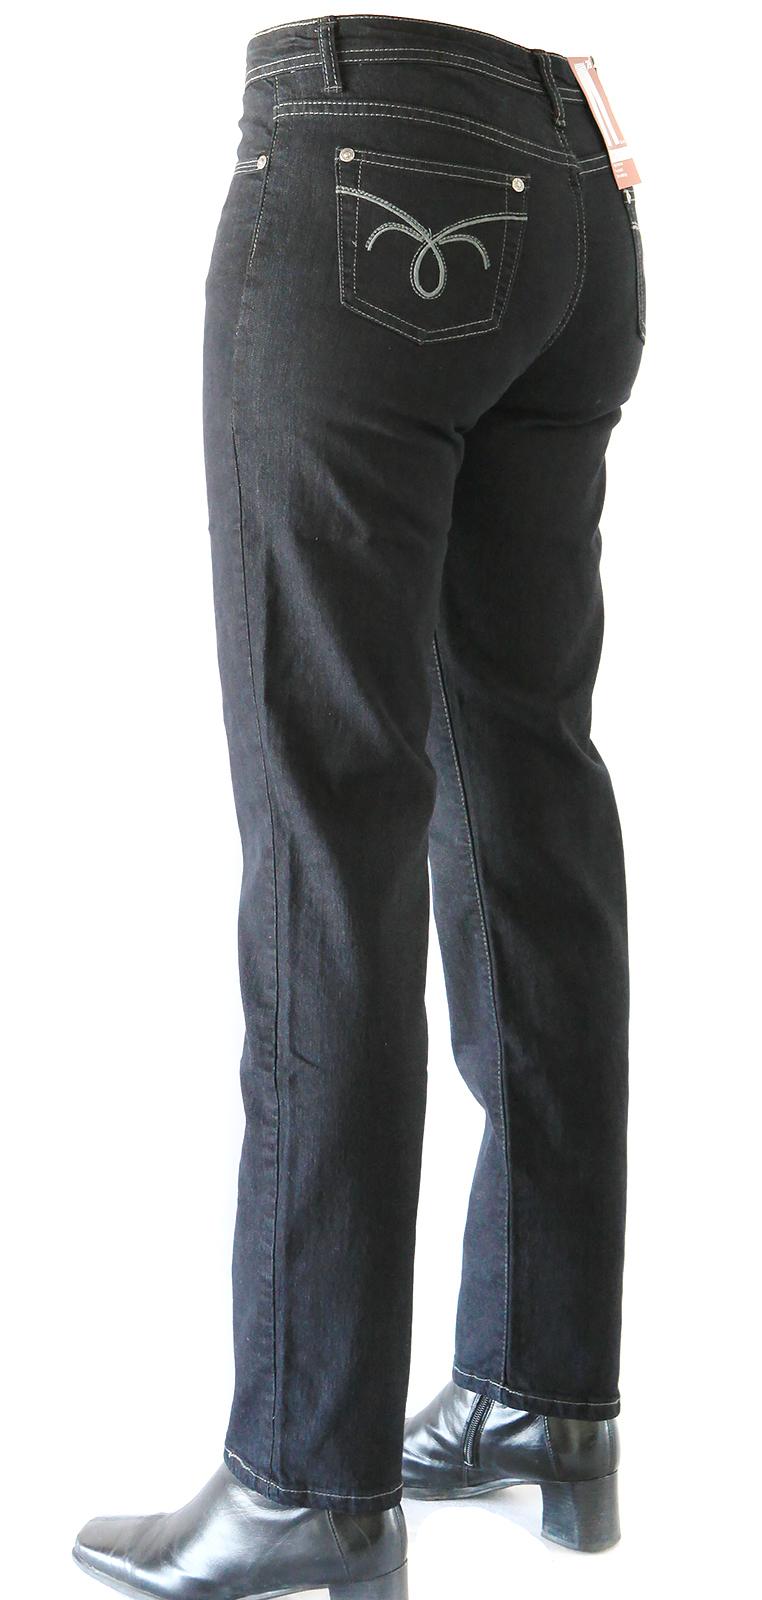 Damen Stretch Jeans von Jet-Line  Modell Betty Slim Black Damenjeans Damenhose